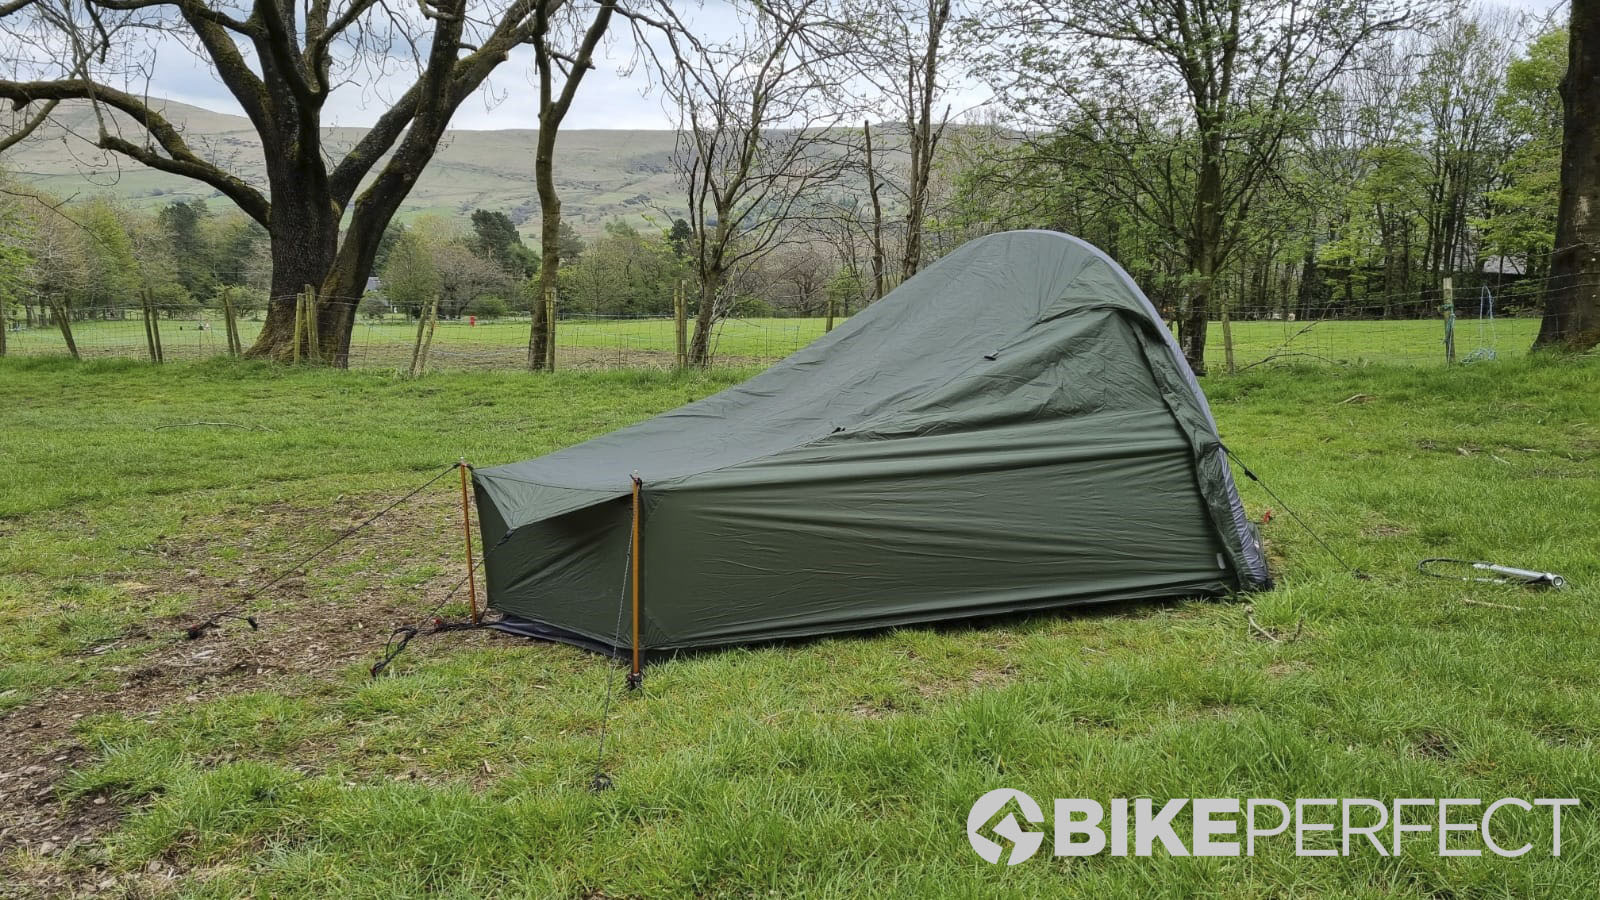 Alpkit Aeronaut 1 tent first look review